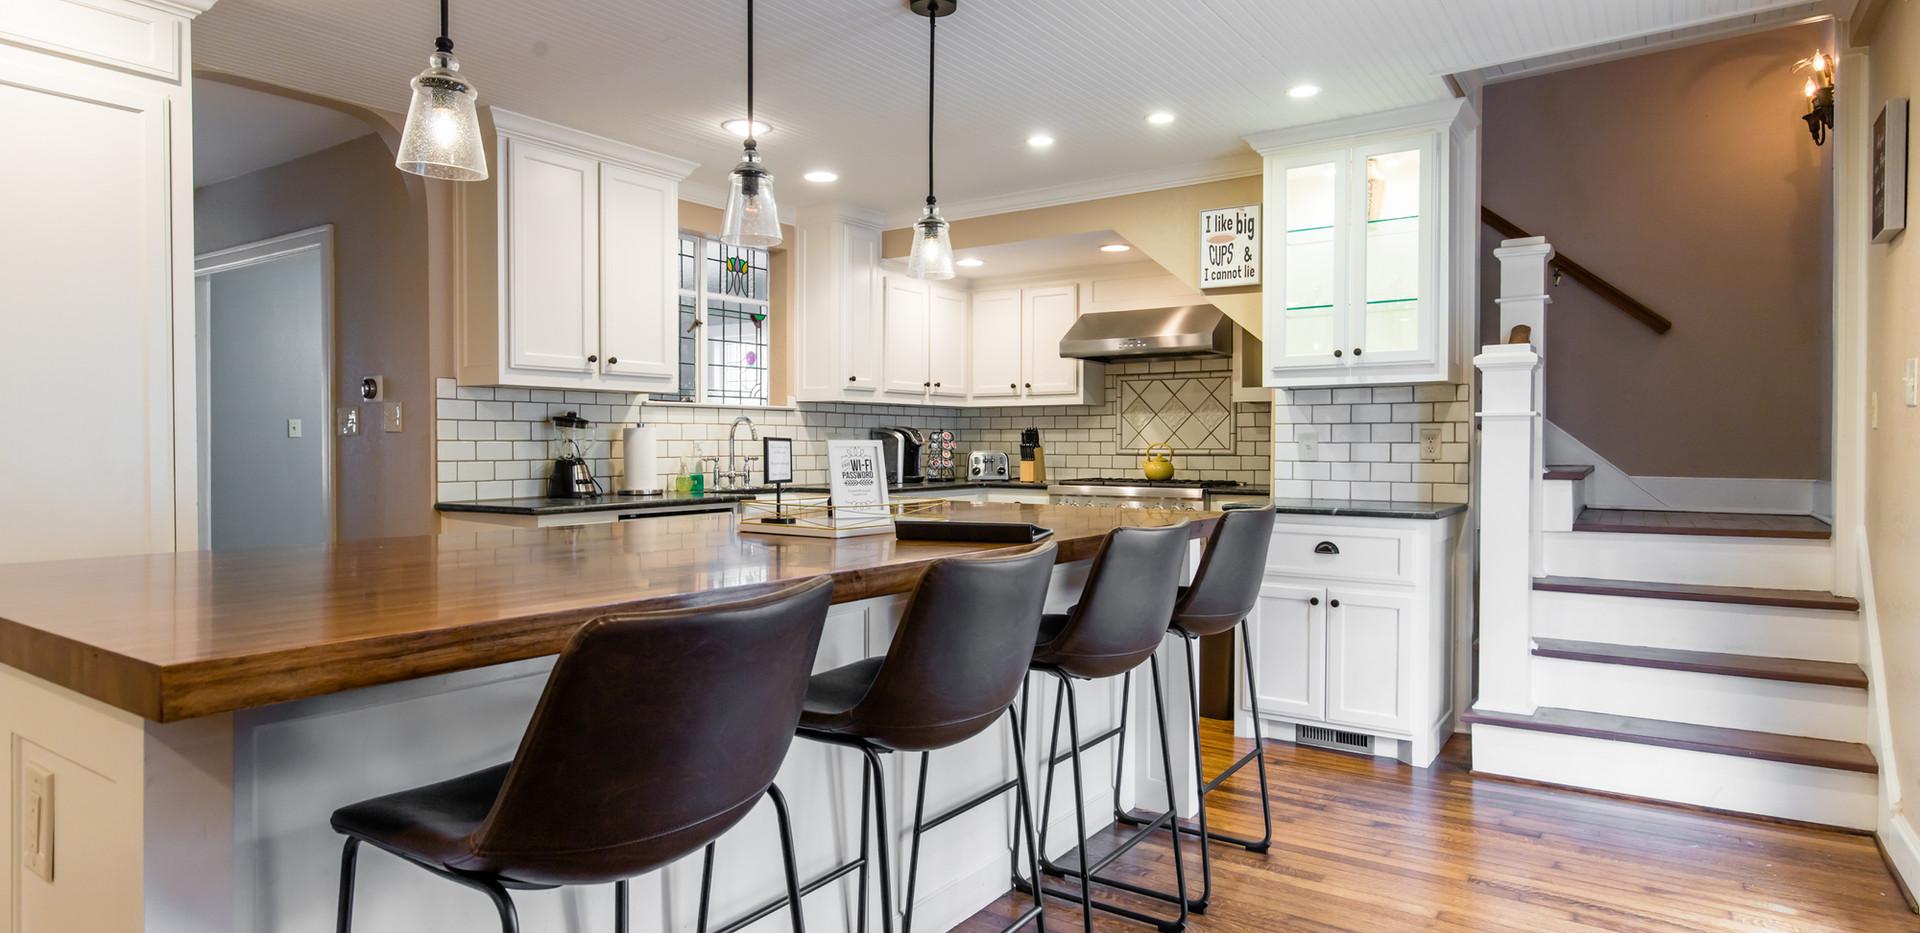 Fort Worth, TX Luxury Airbnb